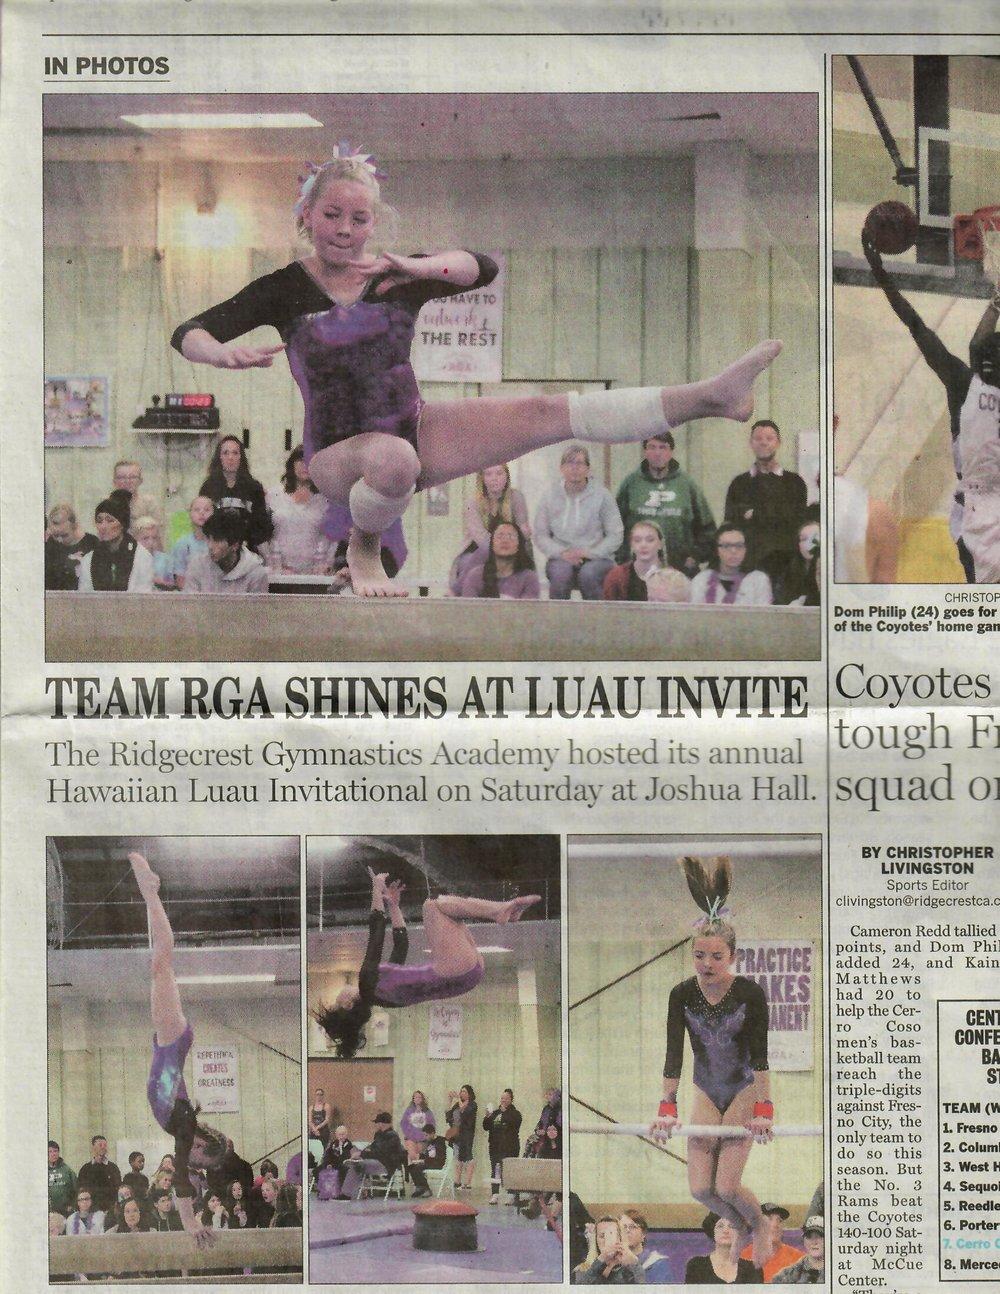 http://www.ridgecrestca.com/sports/20180125/team-rga-to-host-2nd-luau-invite-saturday